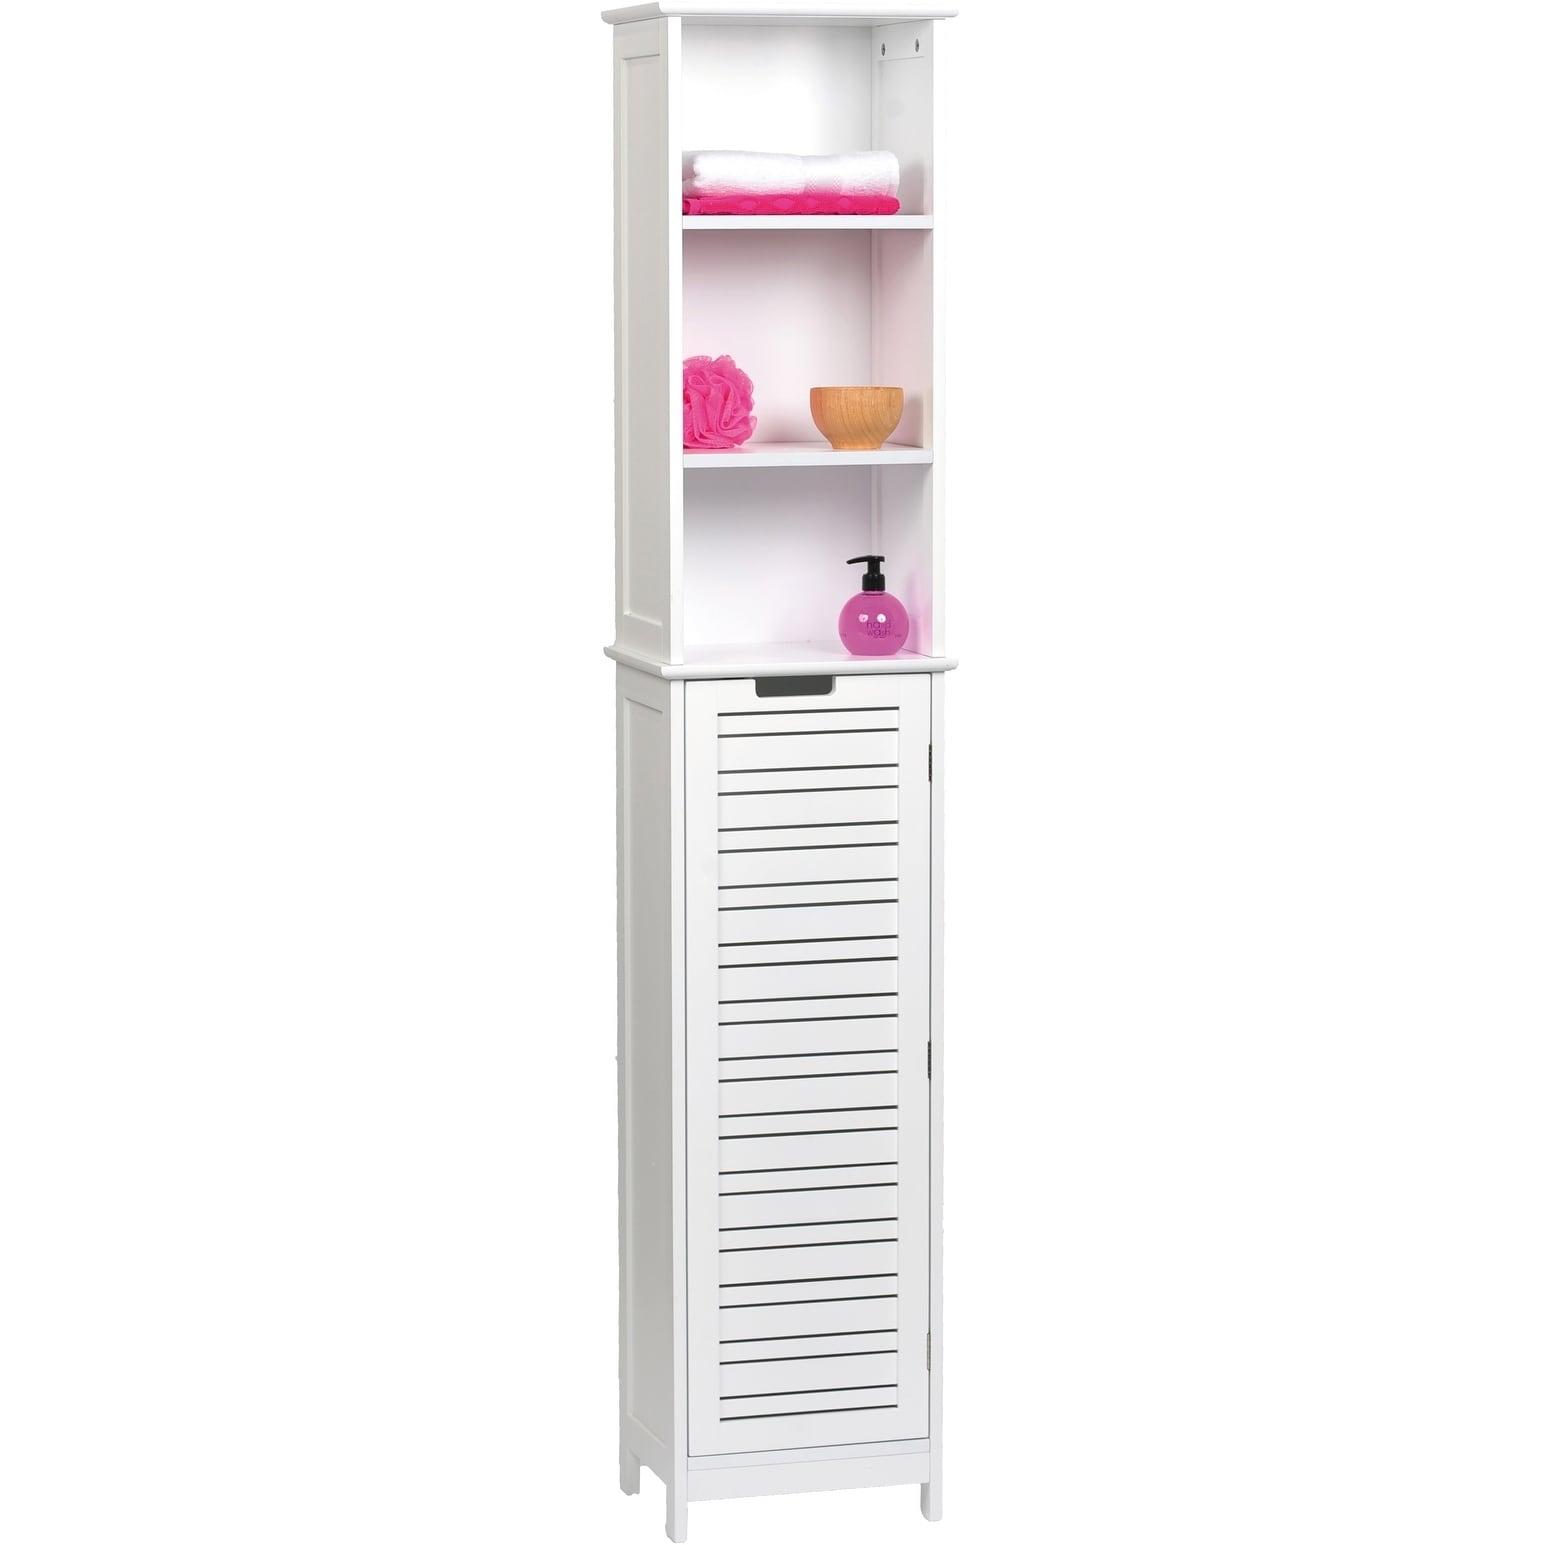 Shop Evideco Bathroom Free Standing Cabinet Linen Tower Miami White ...